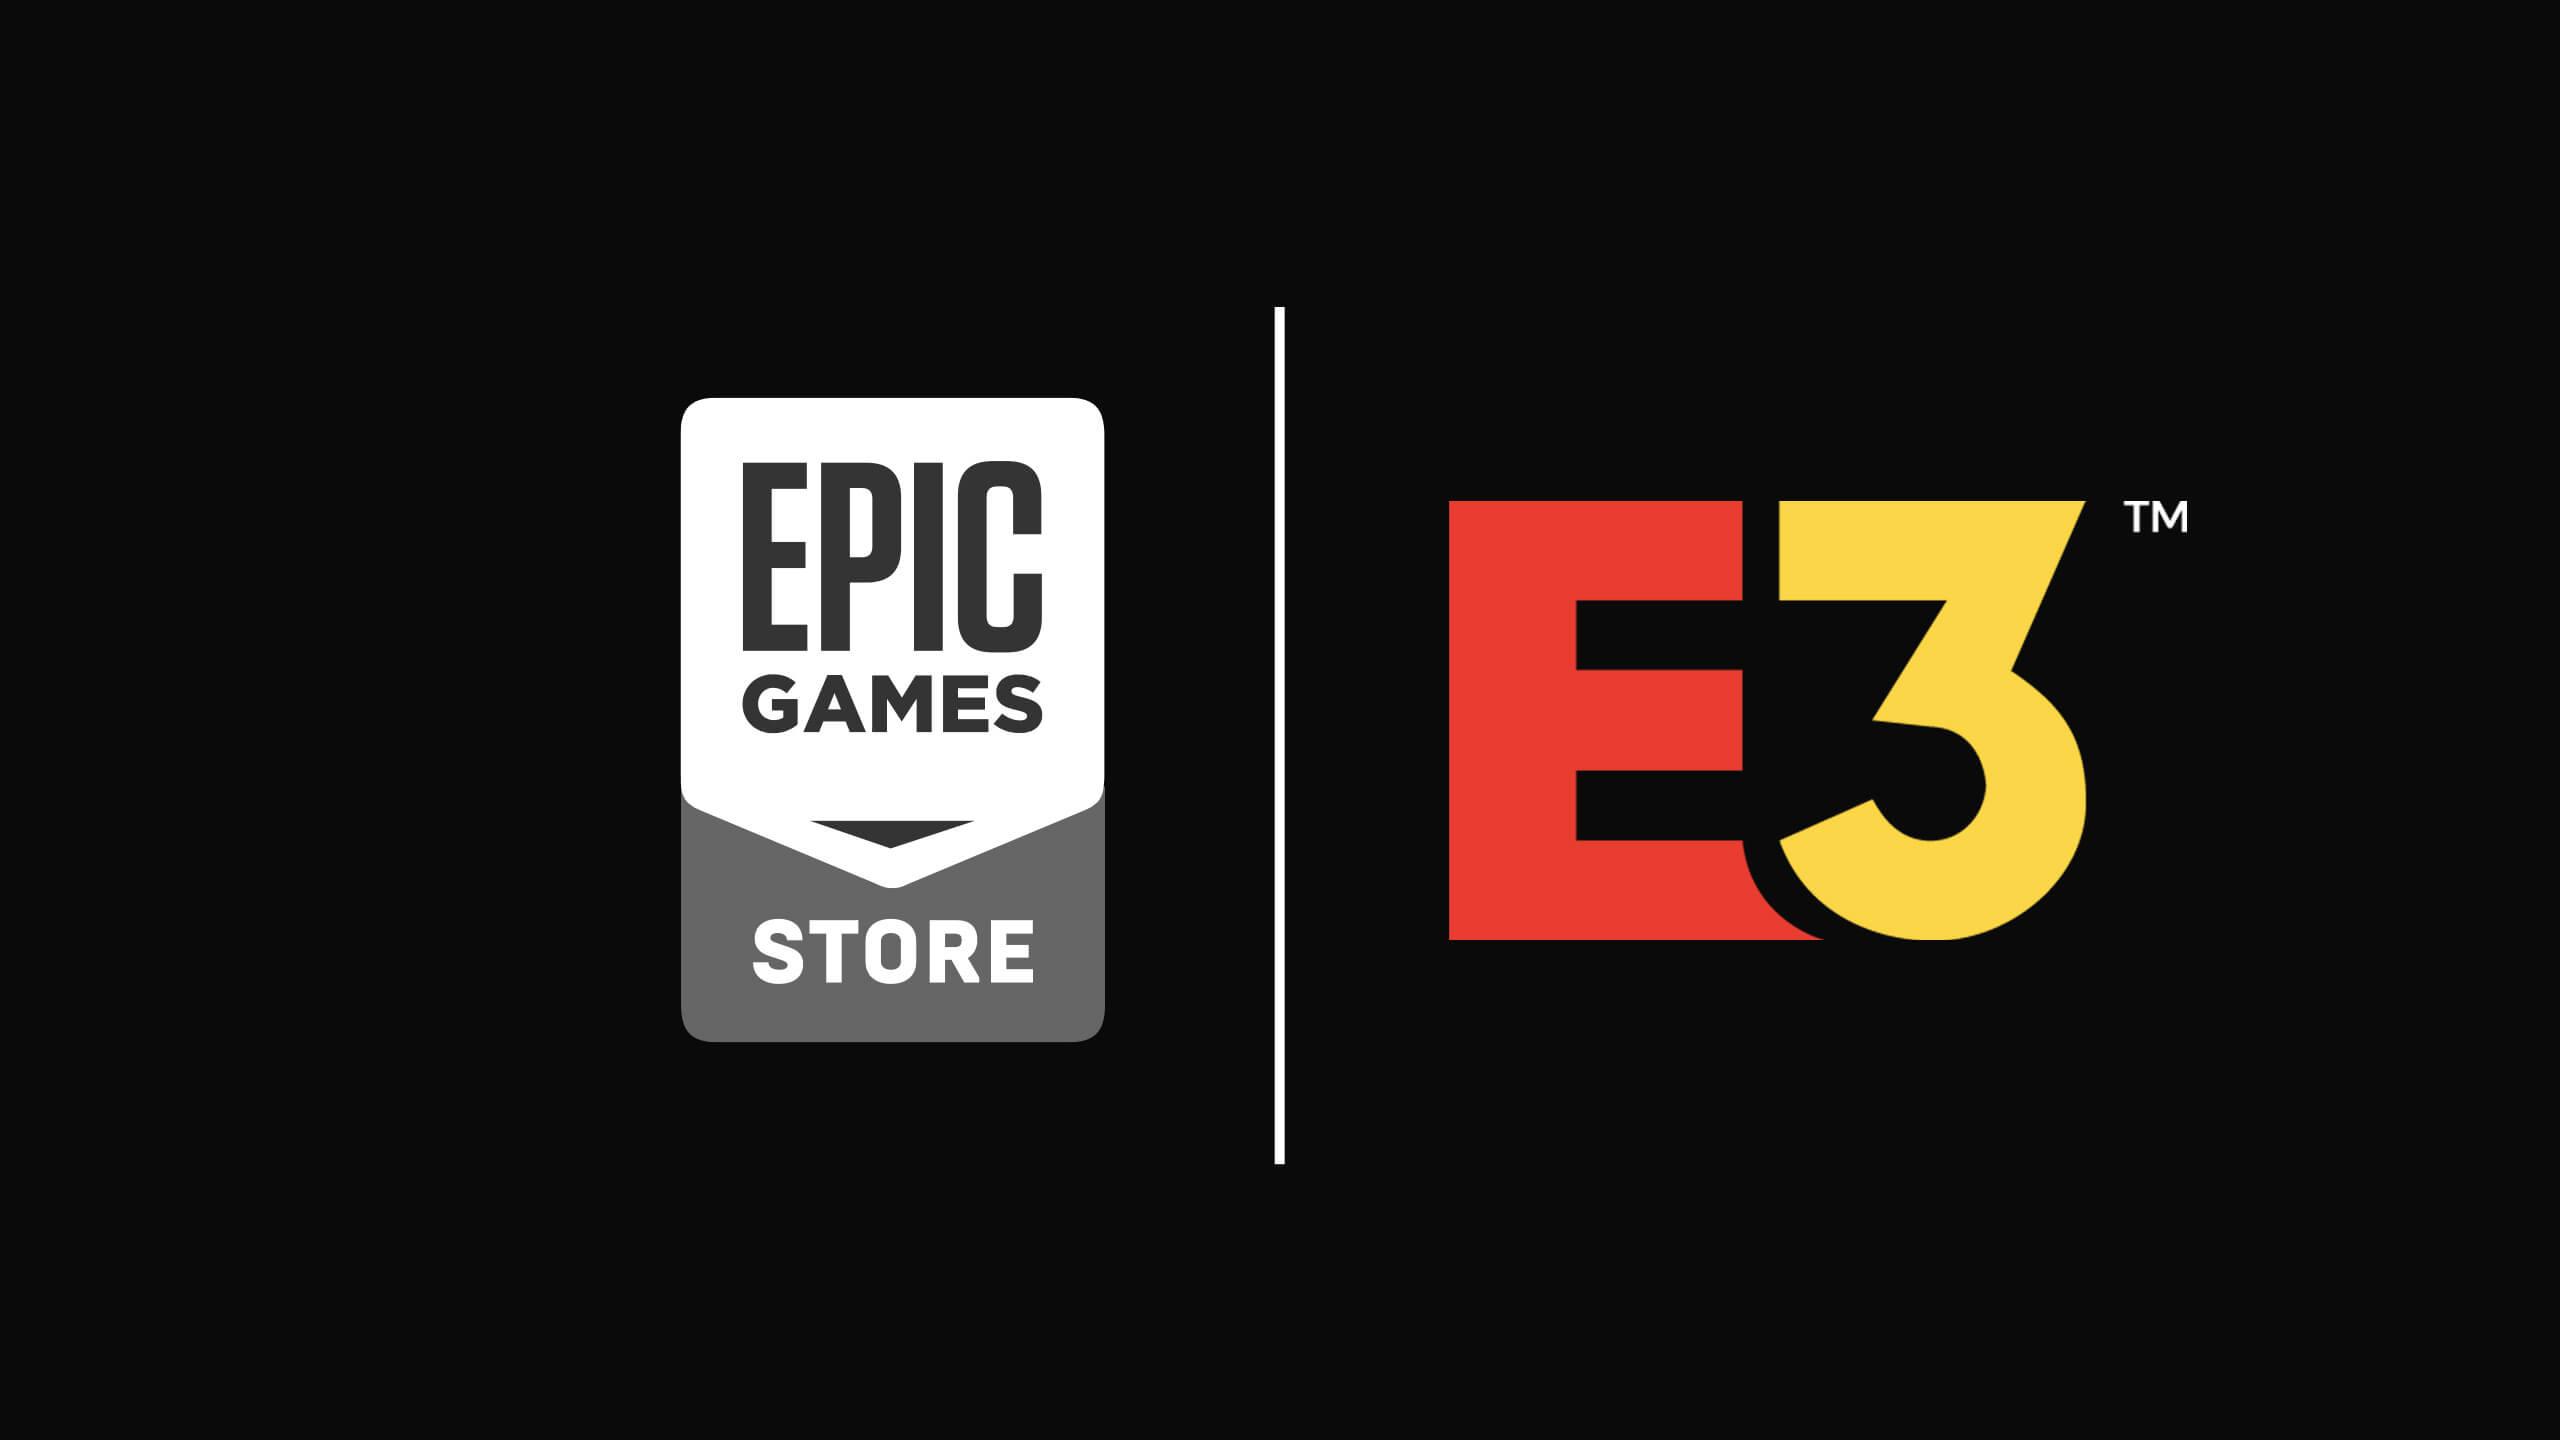 Epic Games(E3 2019にて)